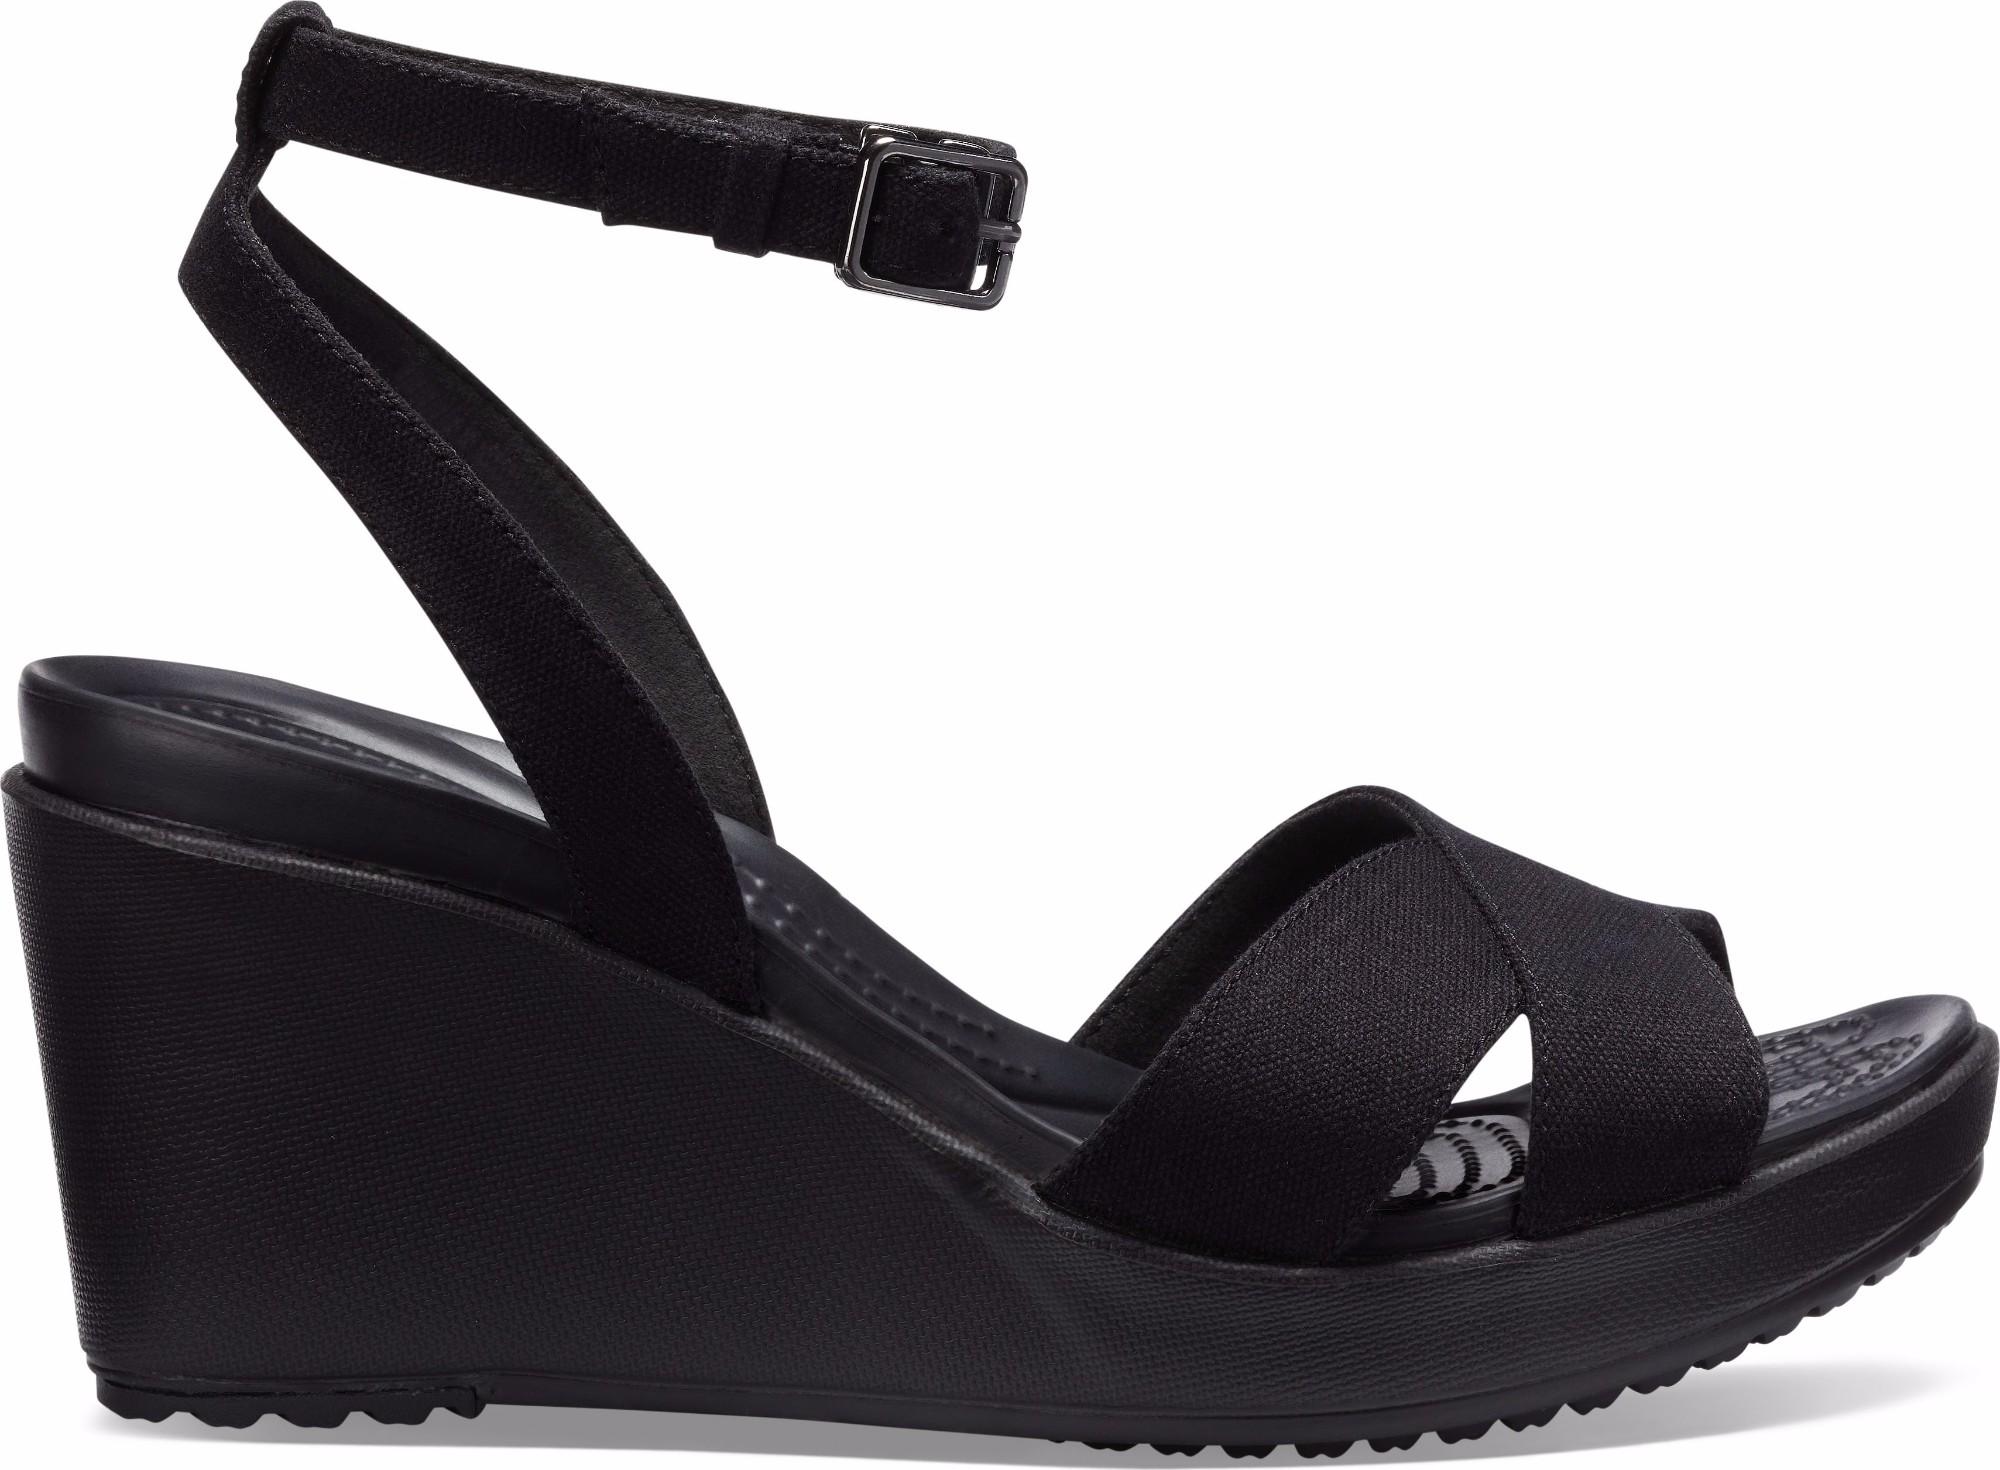 Crocs™ Women's Leigh II Ankle Strap Wedge Black/Black 39,5